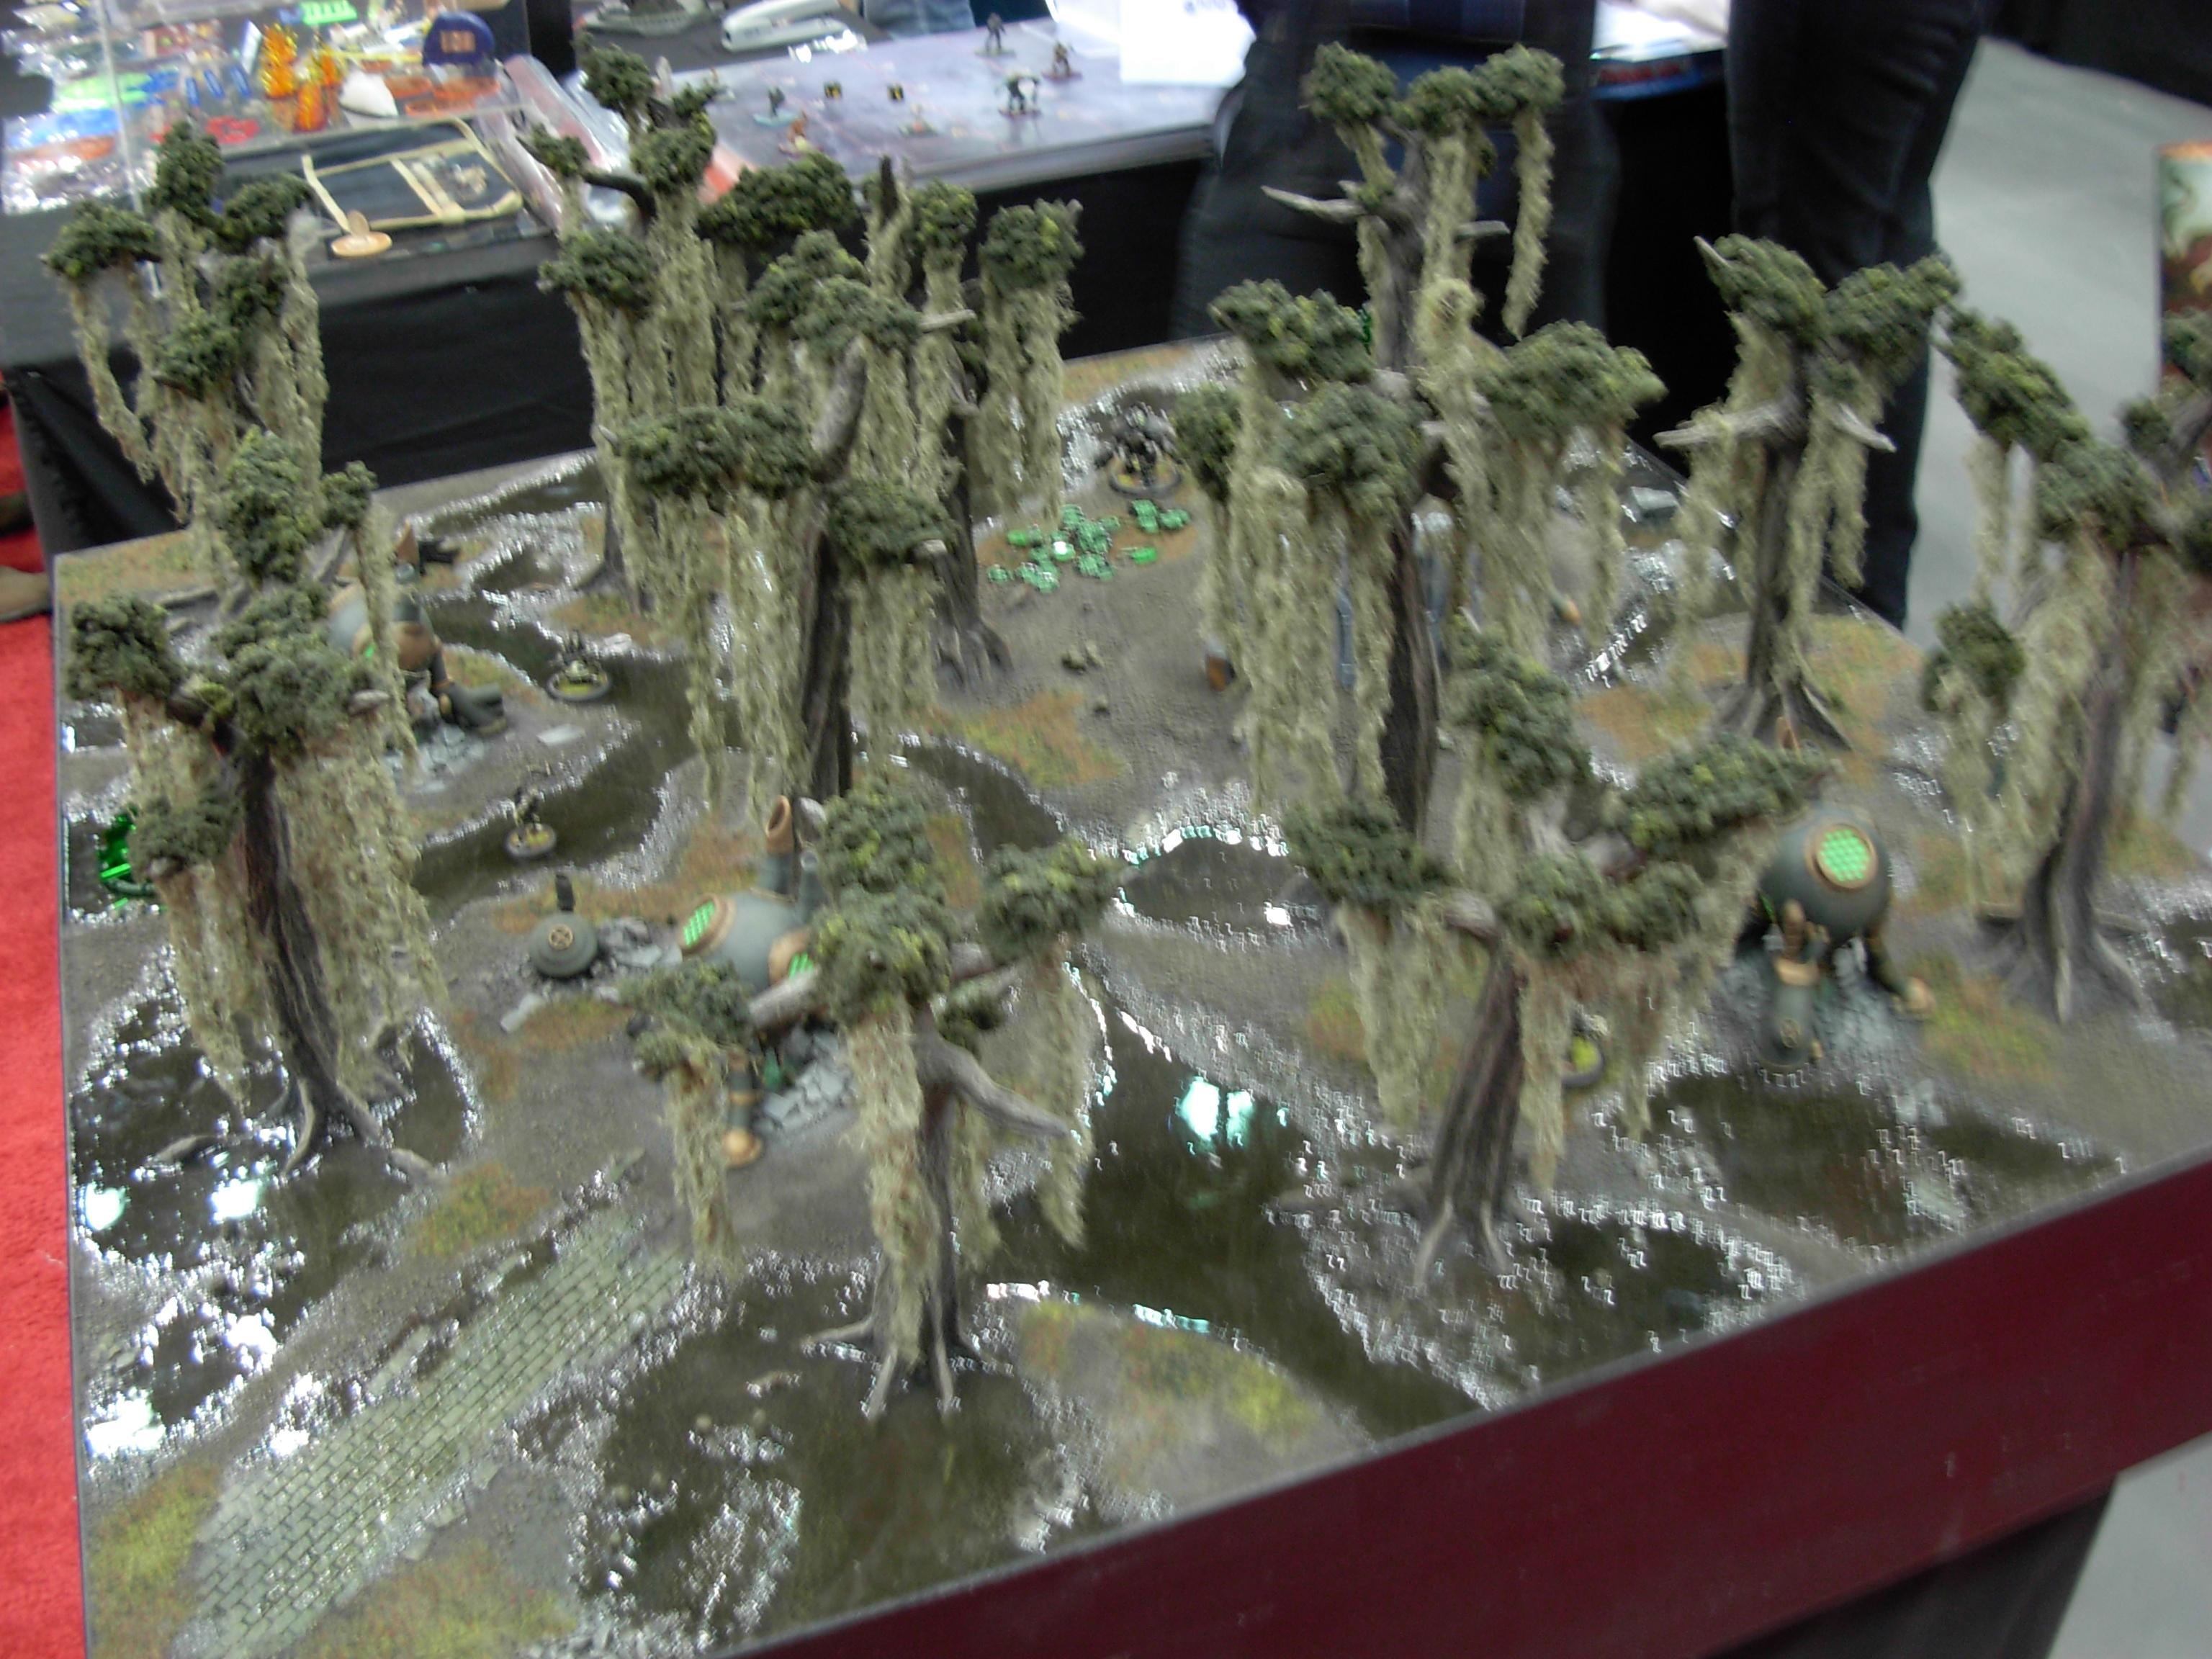 File:Gen Con Indy 2007 - miniature wargame terrain board